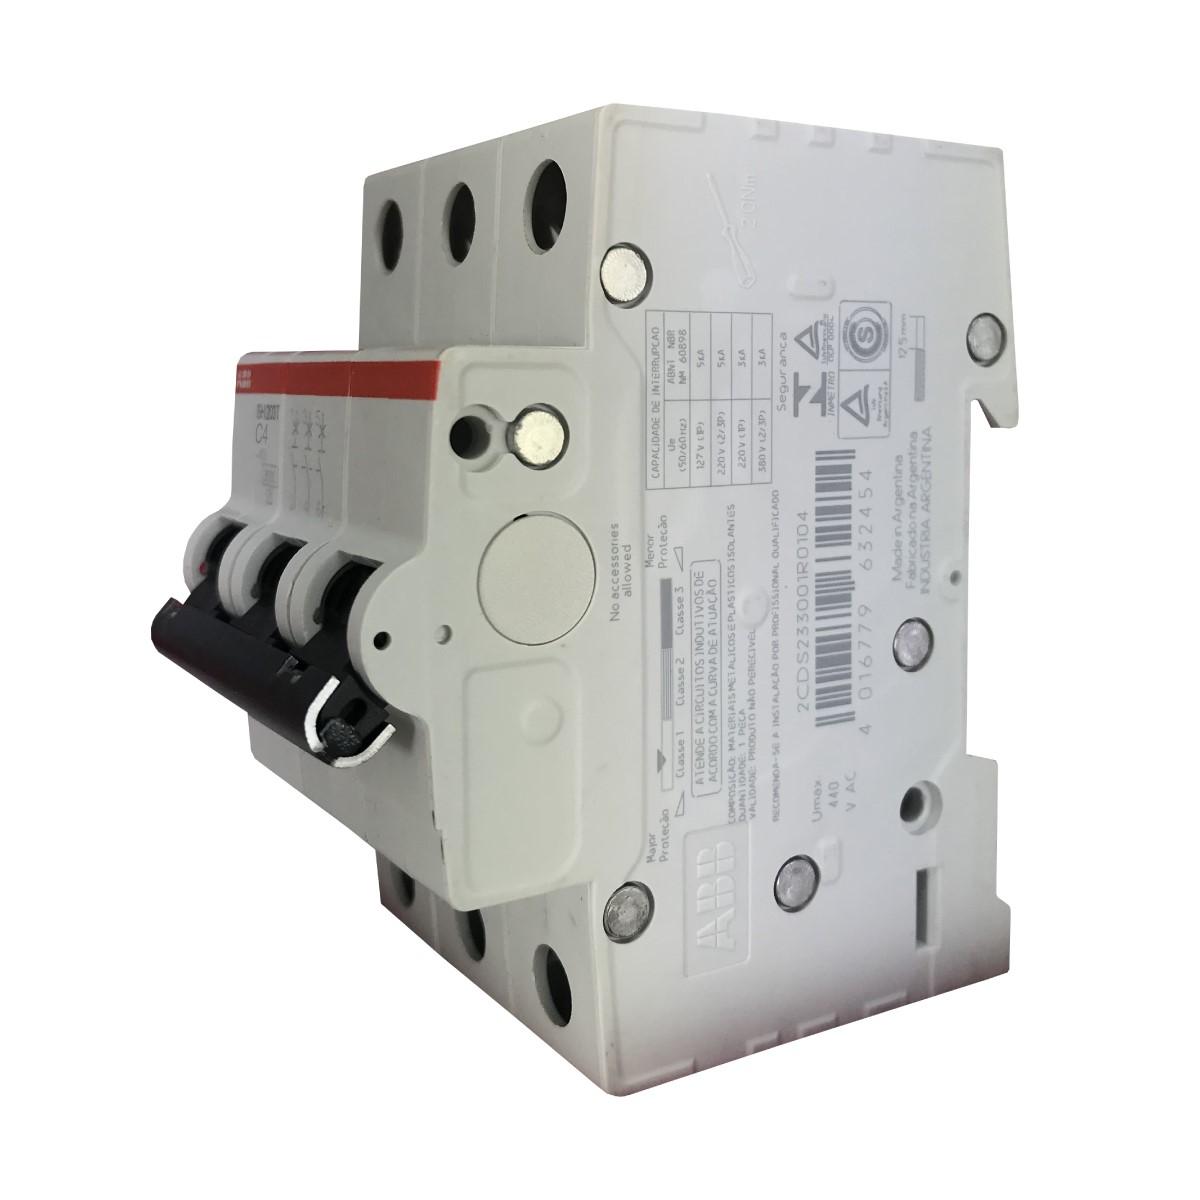 SH203 T-C4_ABB_PeR Automação Industrial